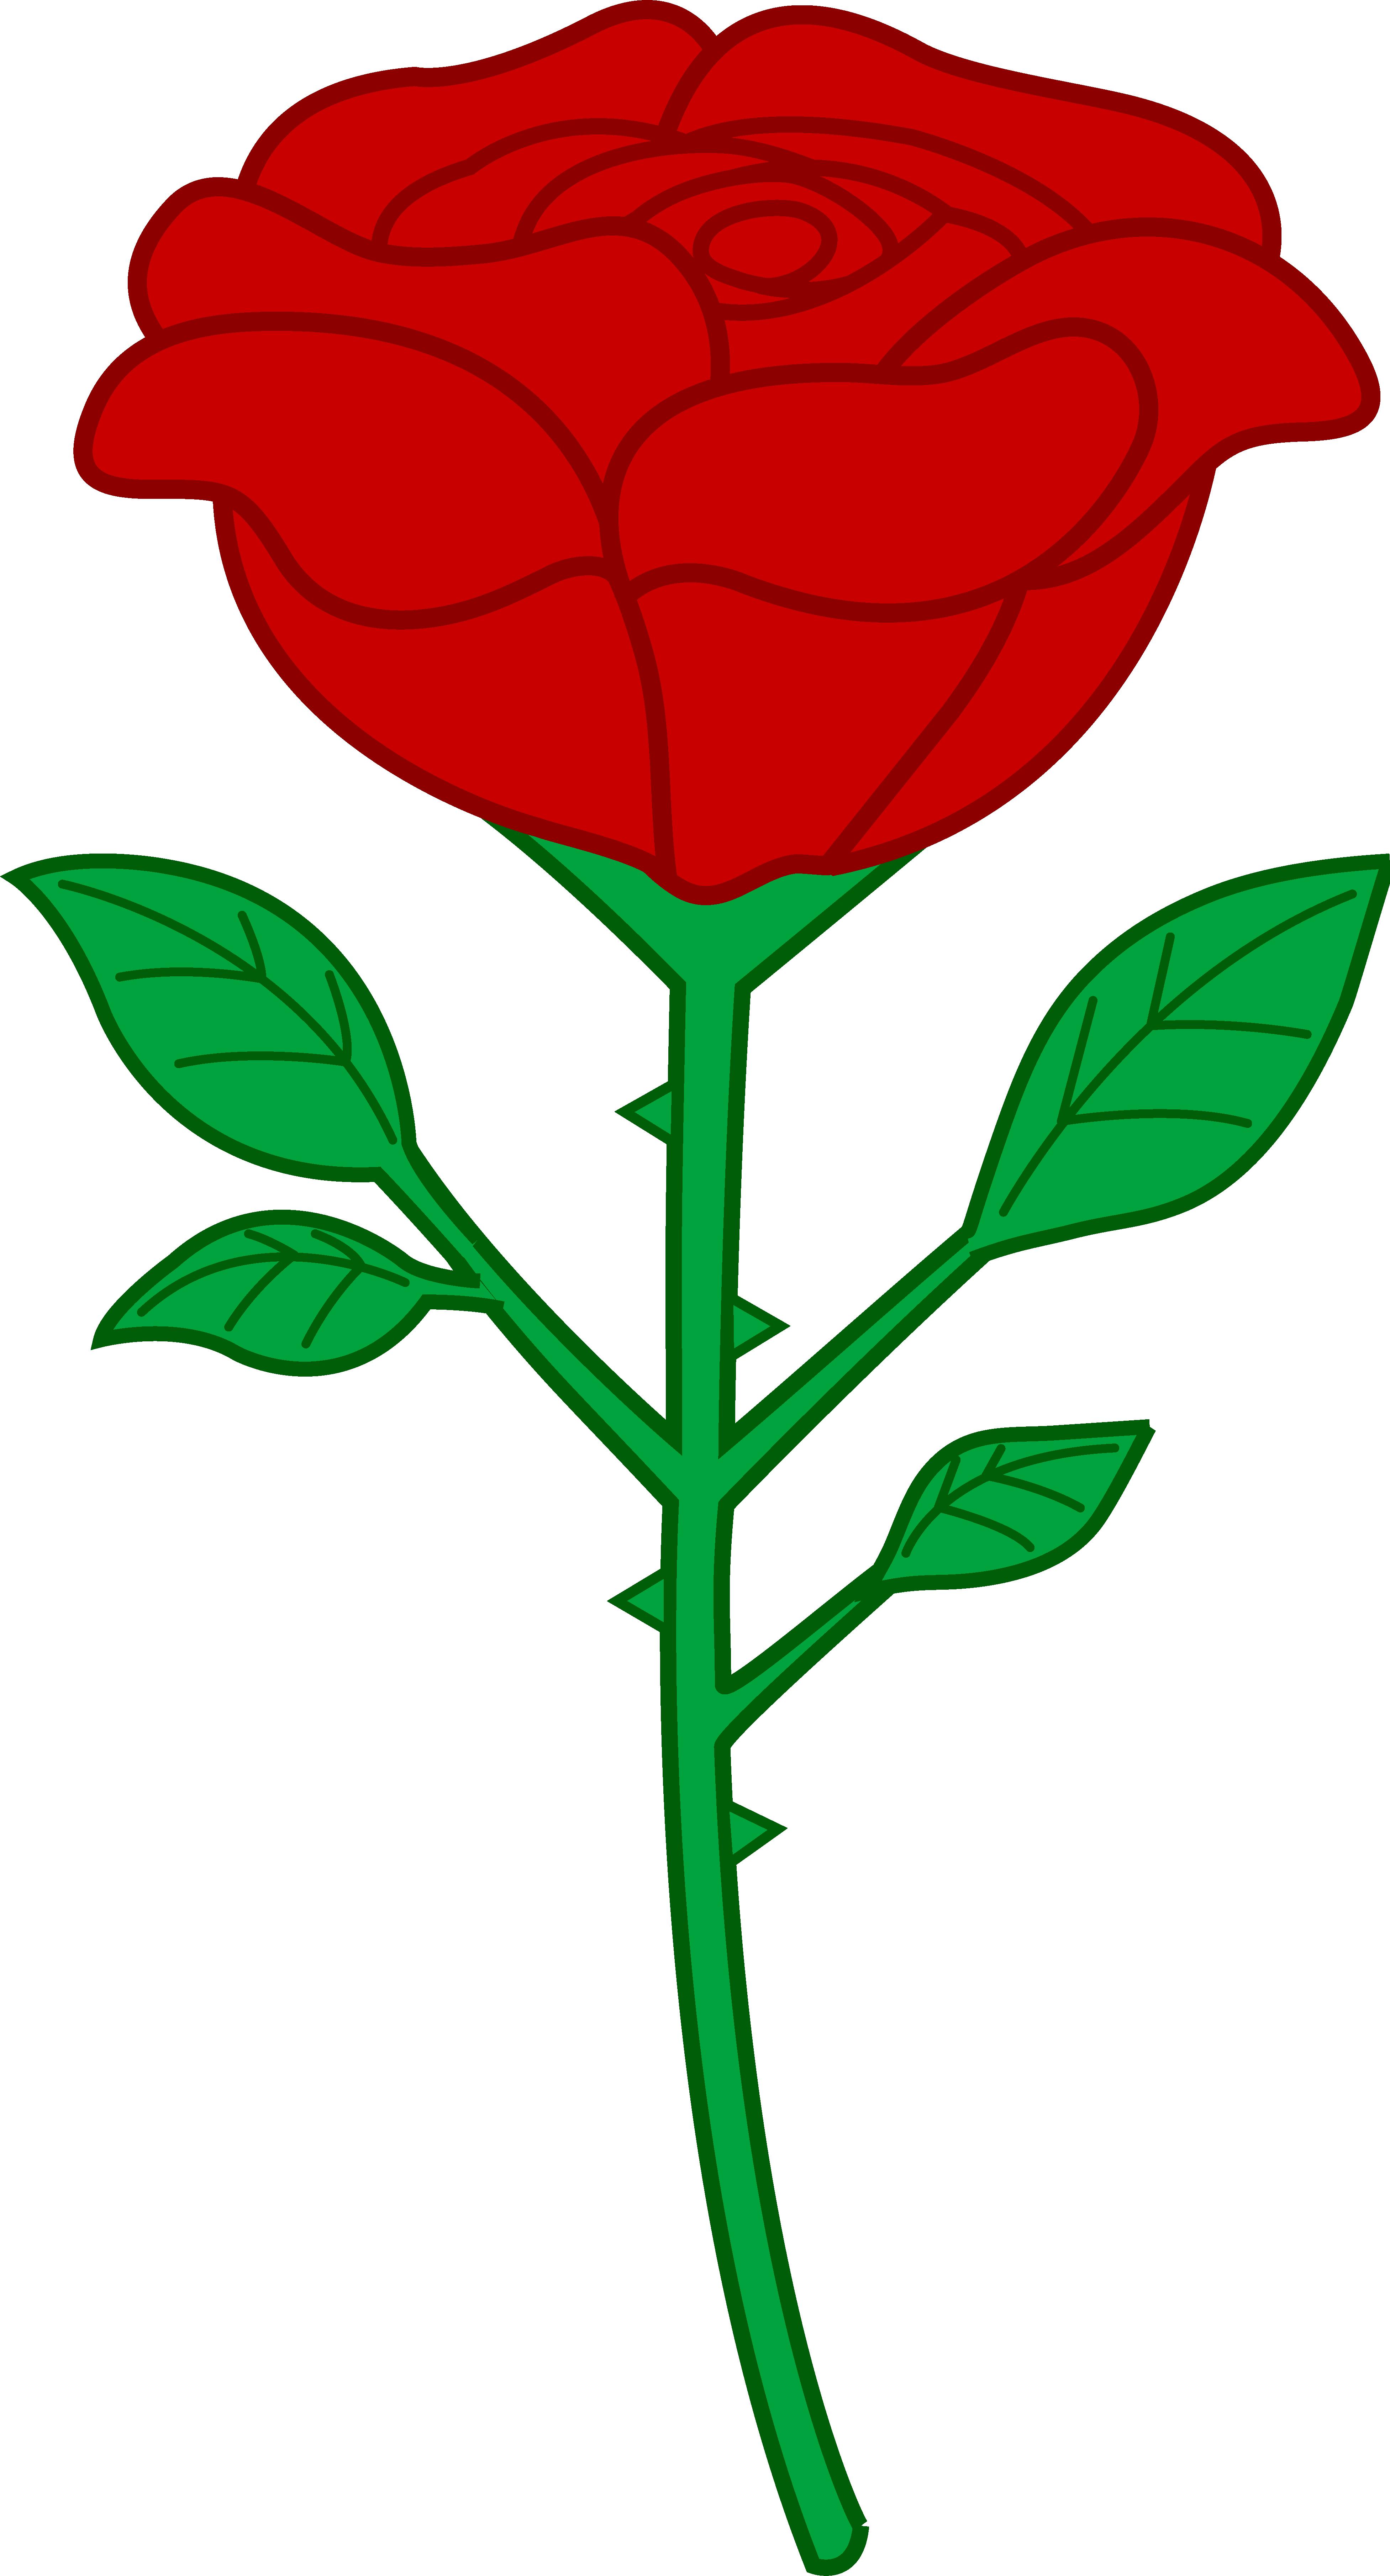 Clipart rose. Cartoon roses